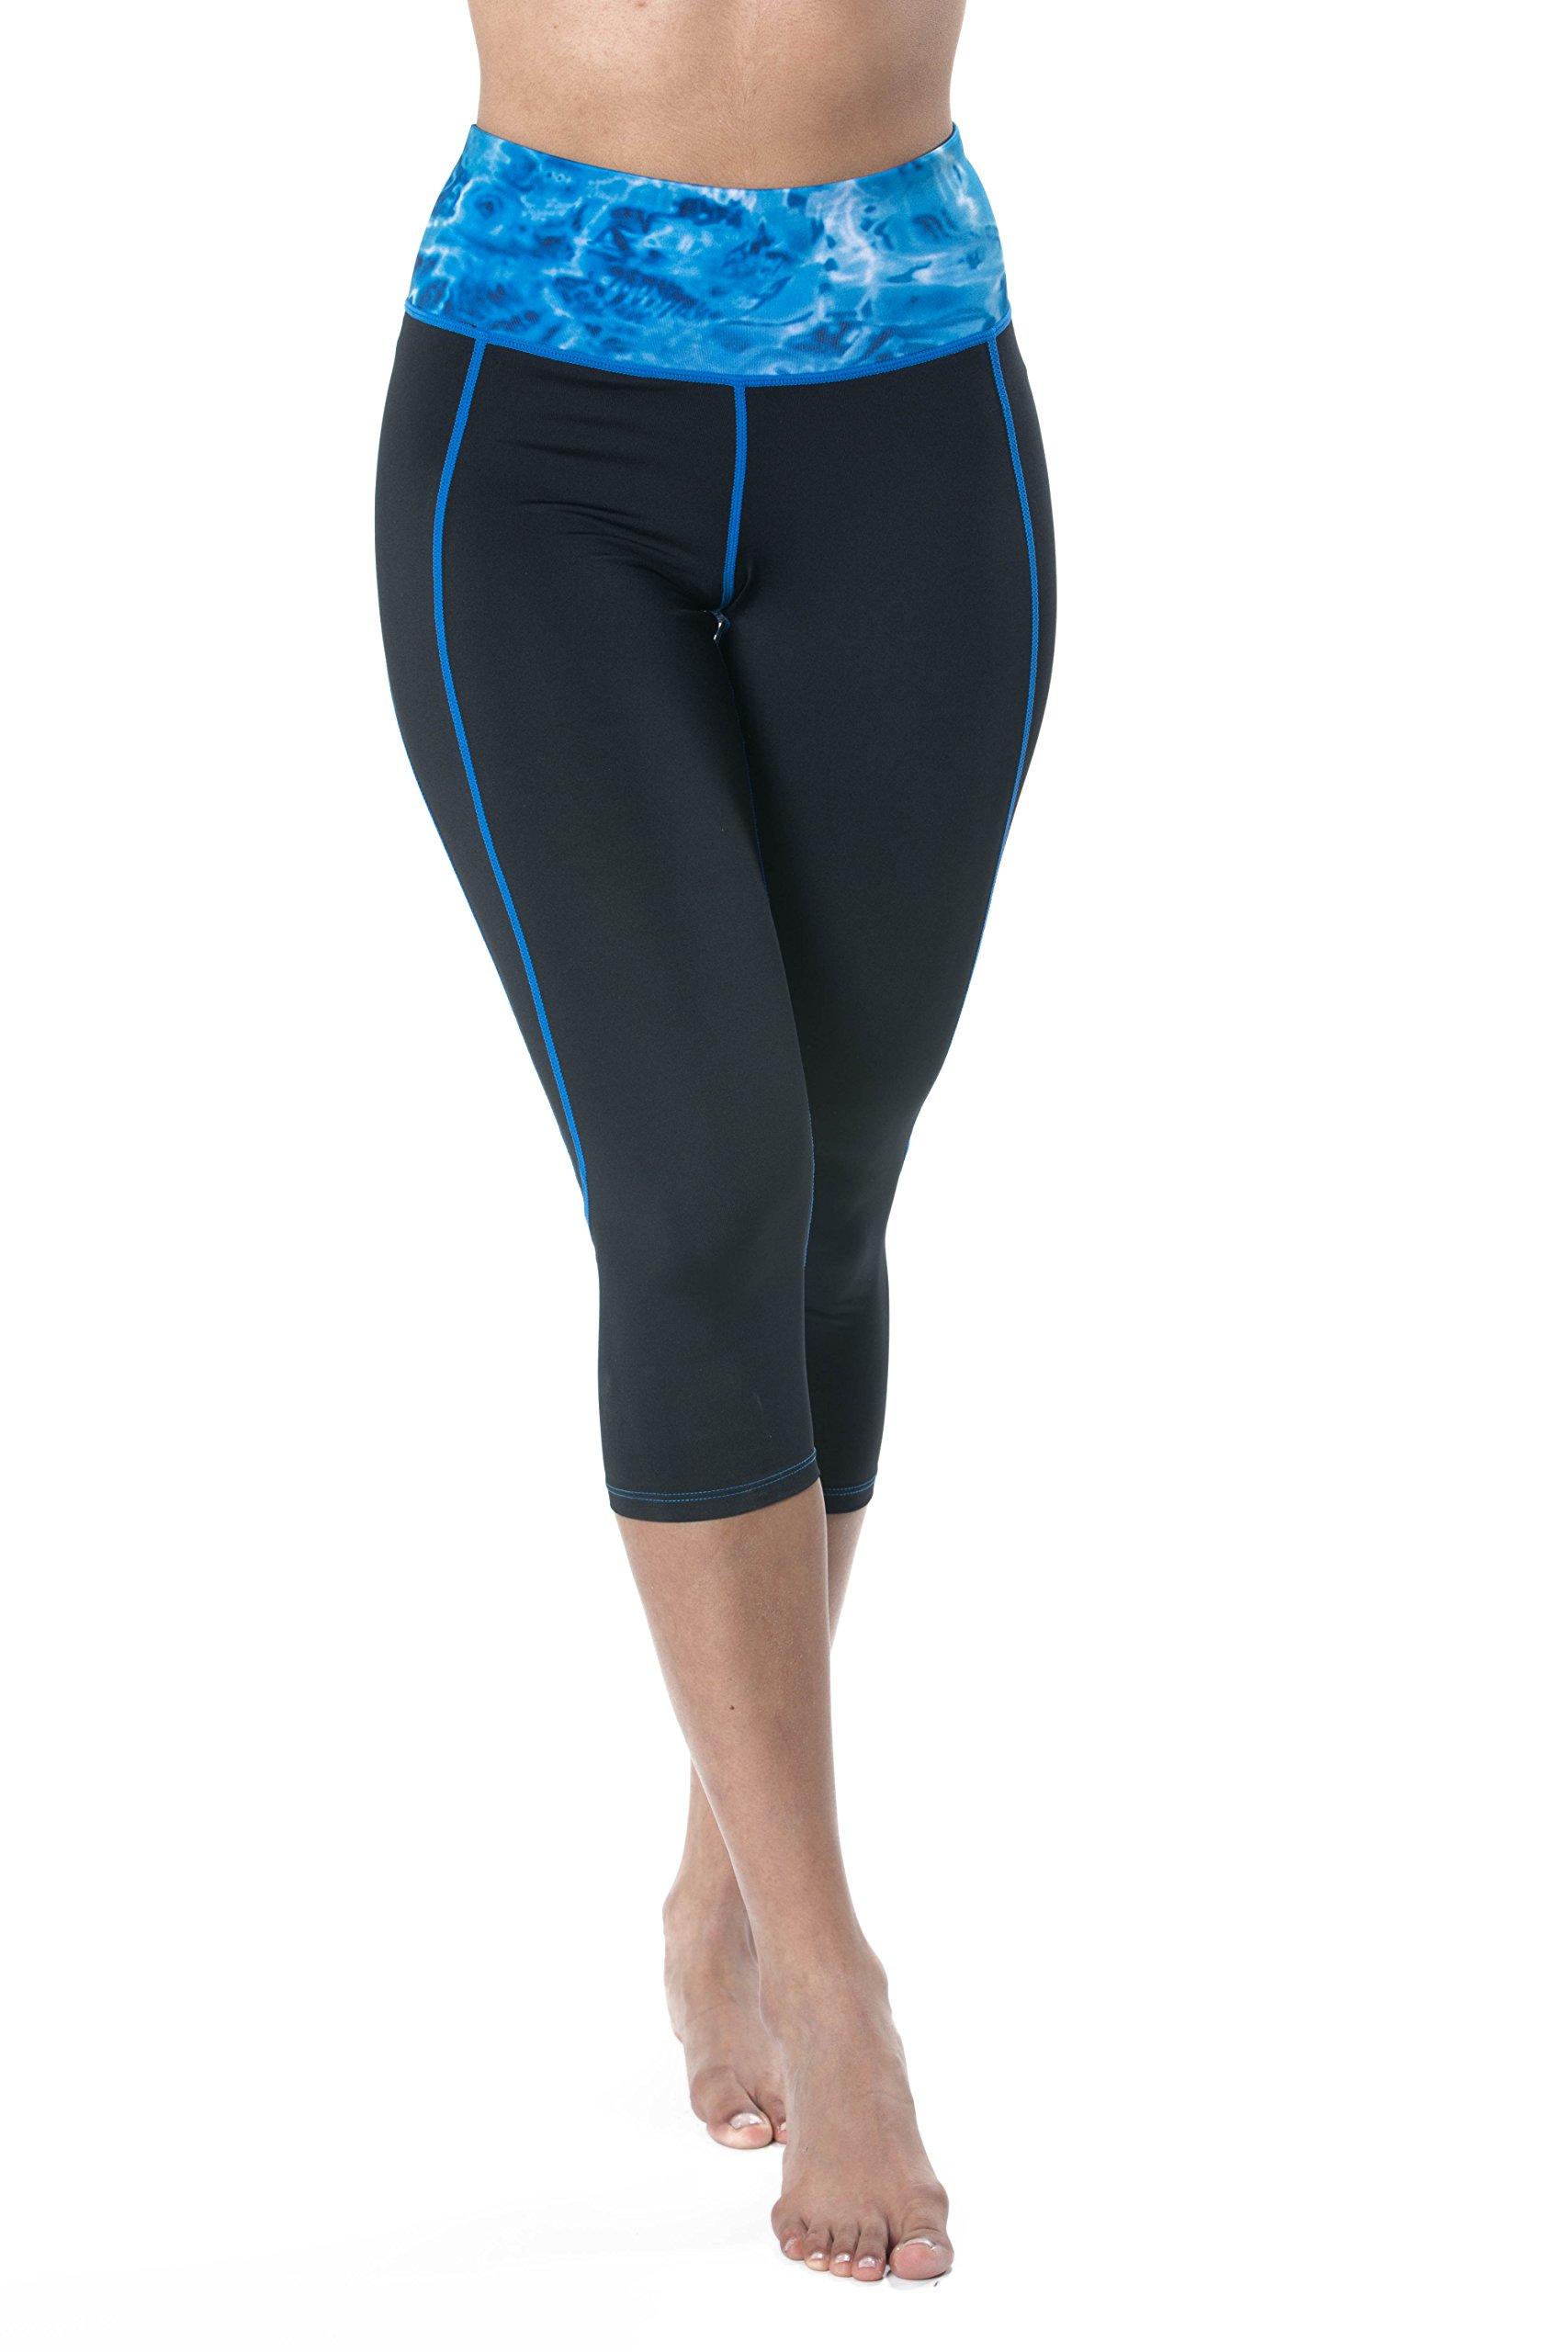 Aqua Design Capri Workout Leggings with Pocket for Women